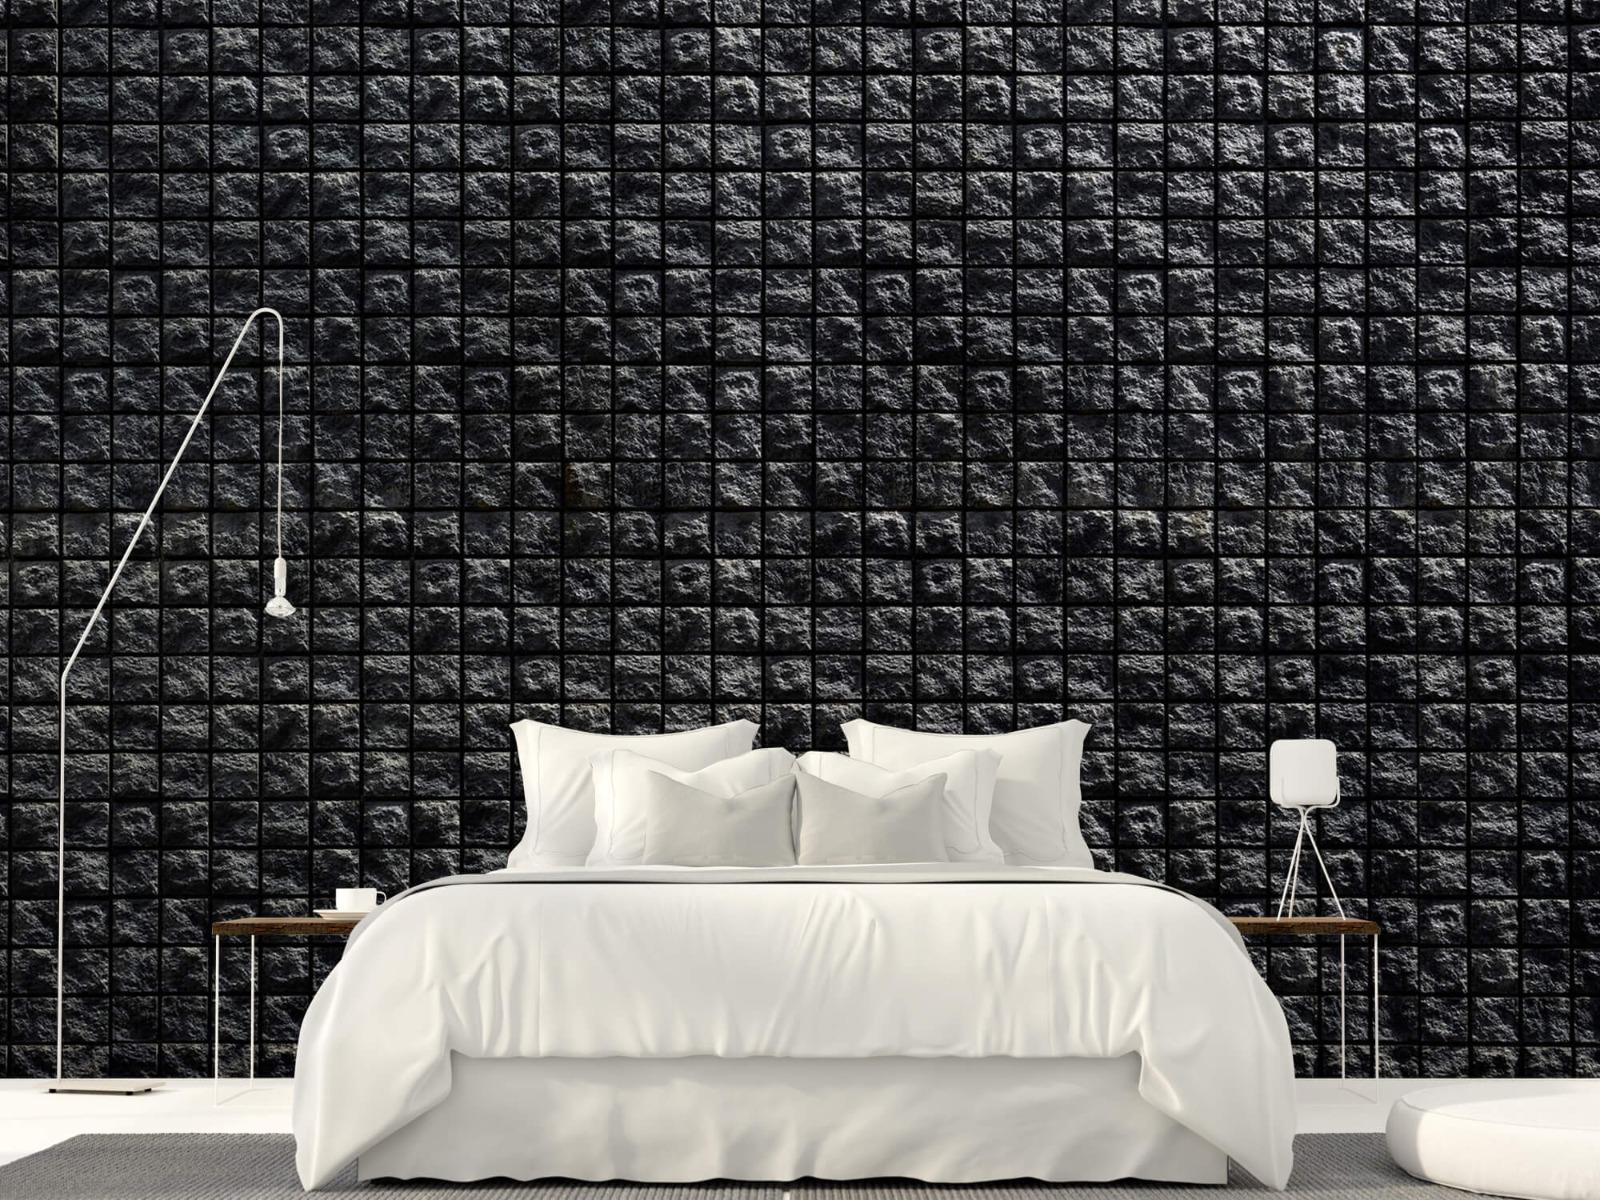 Tegel behang - Vierkante zwarte stenen - Wallexclusive - Woonkamer 16